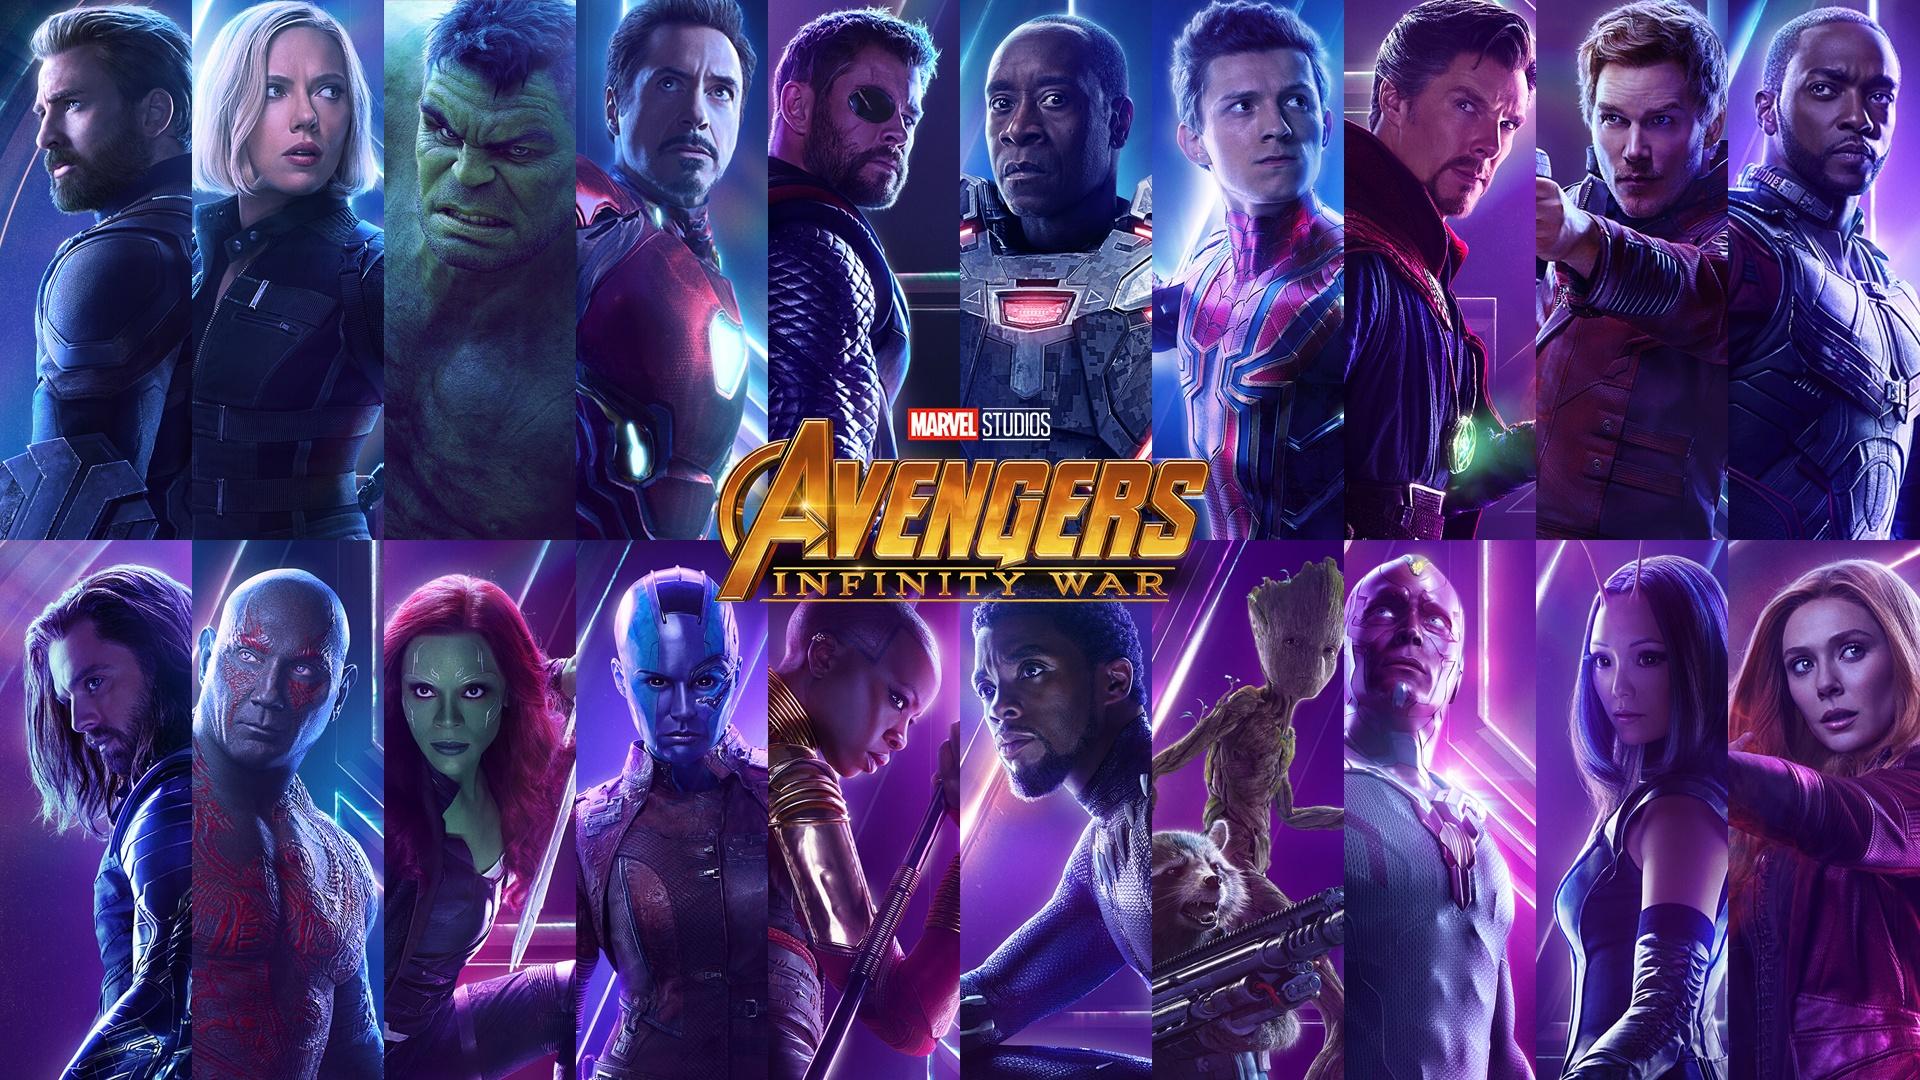 'Avengers: Cuoc chien Vo cuc': 10 nam cho doi, 150 phut hoanh trang hinh anh 2